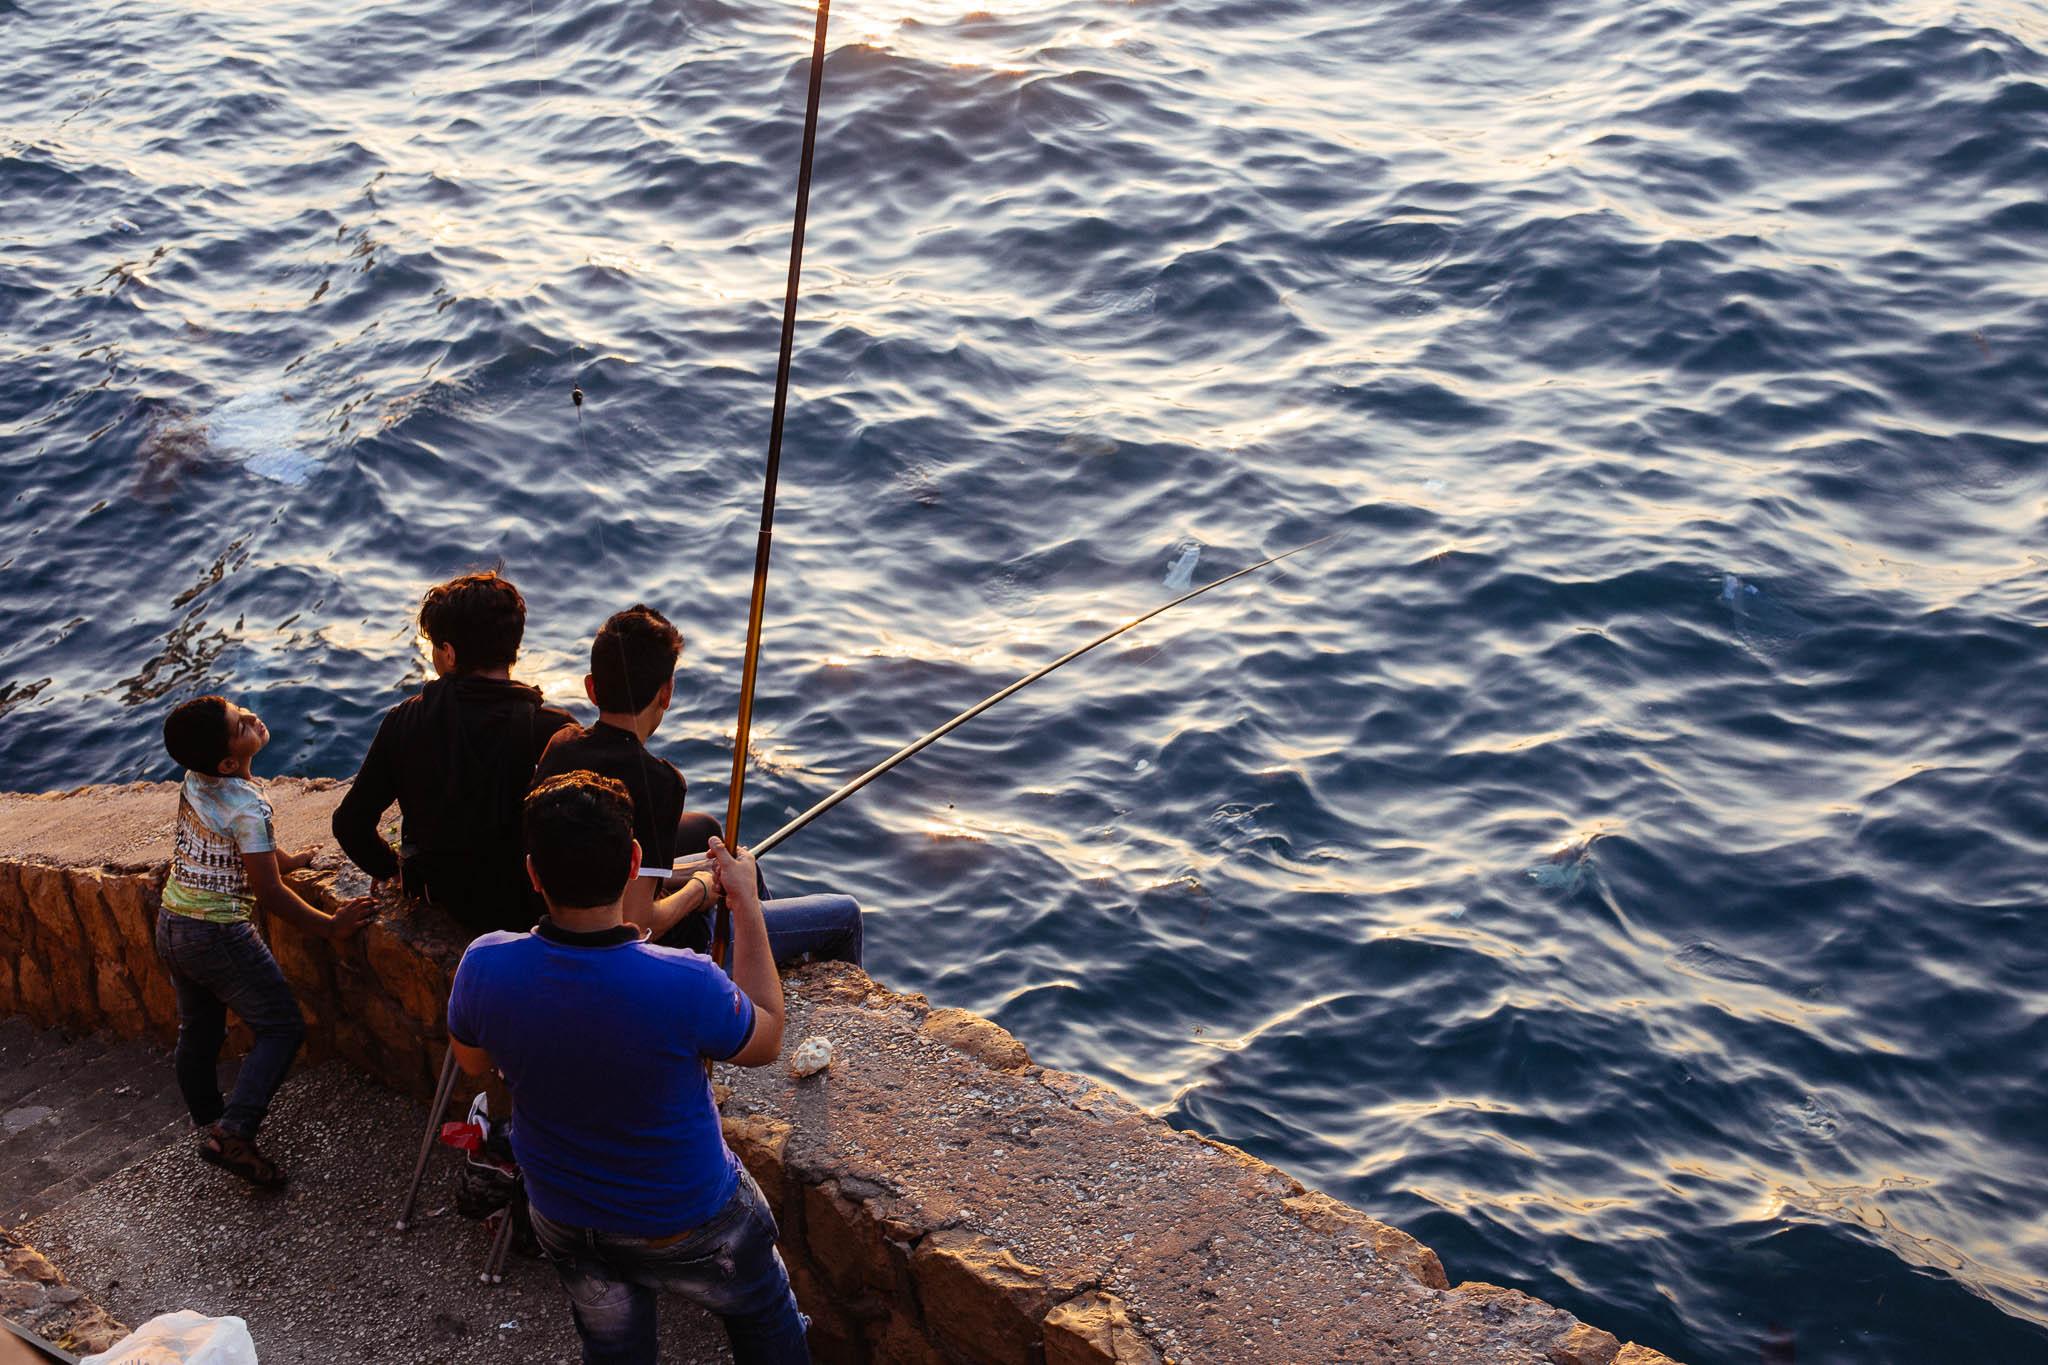 singapore-photographer-beirut-lebanon-4649.jpg